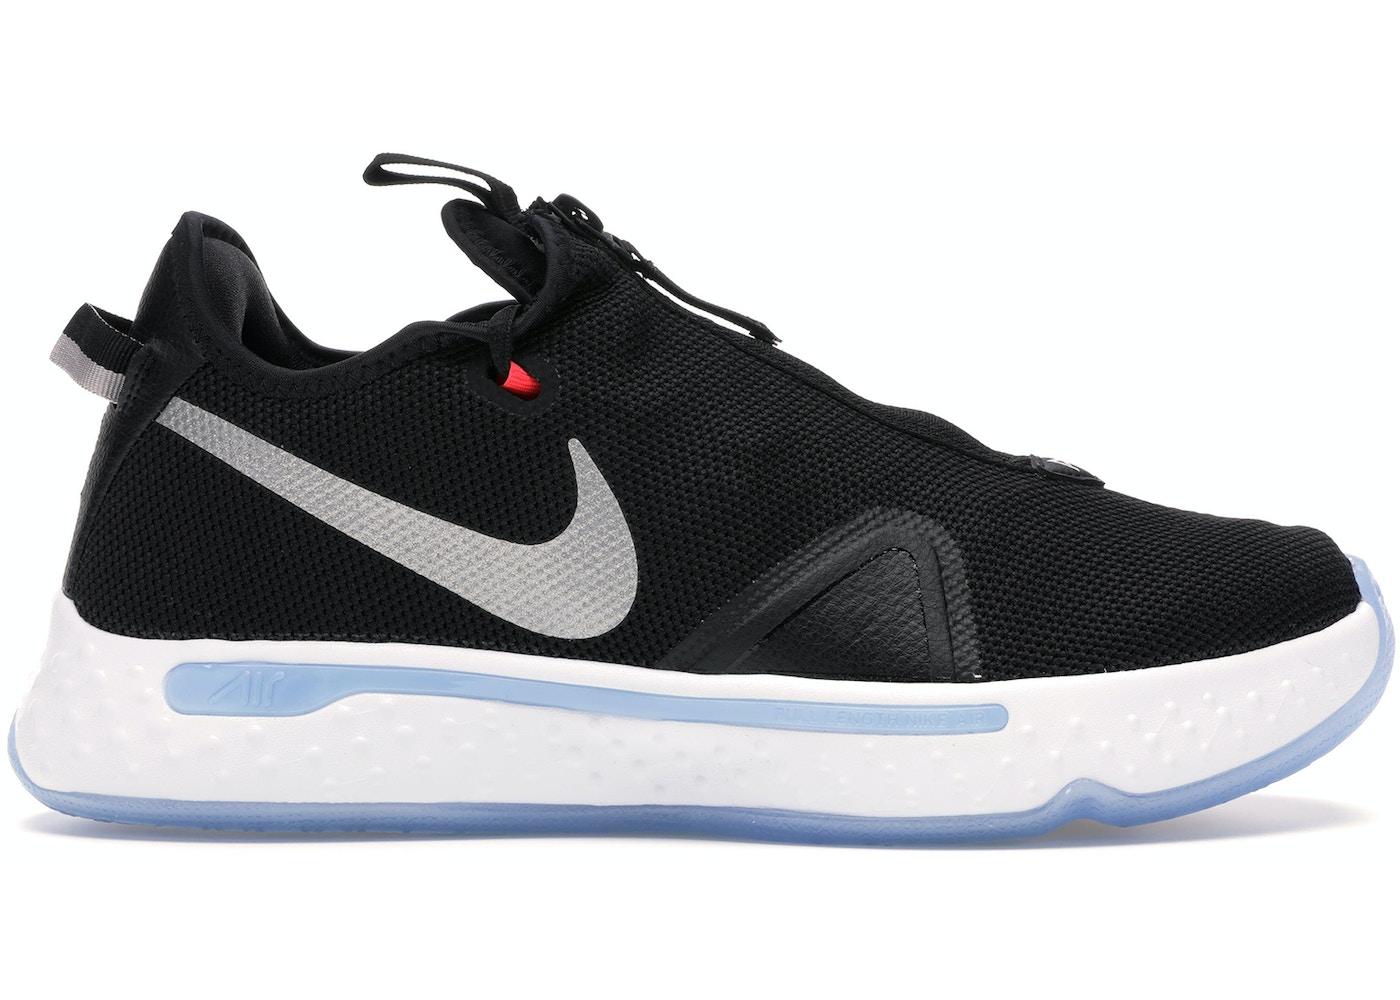 Nike PG 4 Black Light Smoke Grey - CD5082-001/CD5079-001